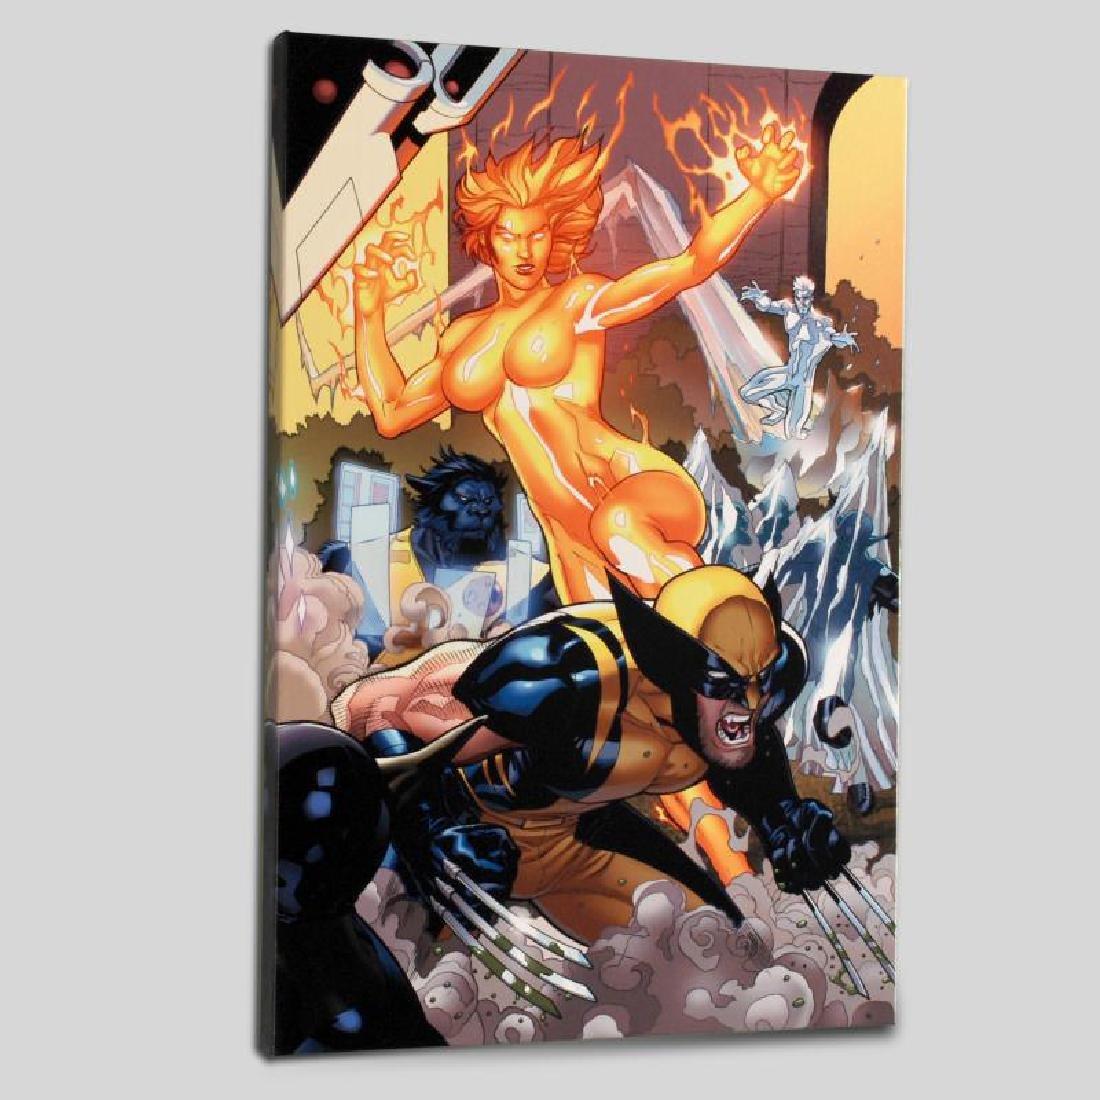 """Secret Invasion: X-Men #4"" Limited Edition Giclee on"